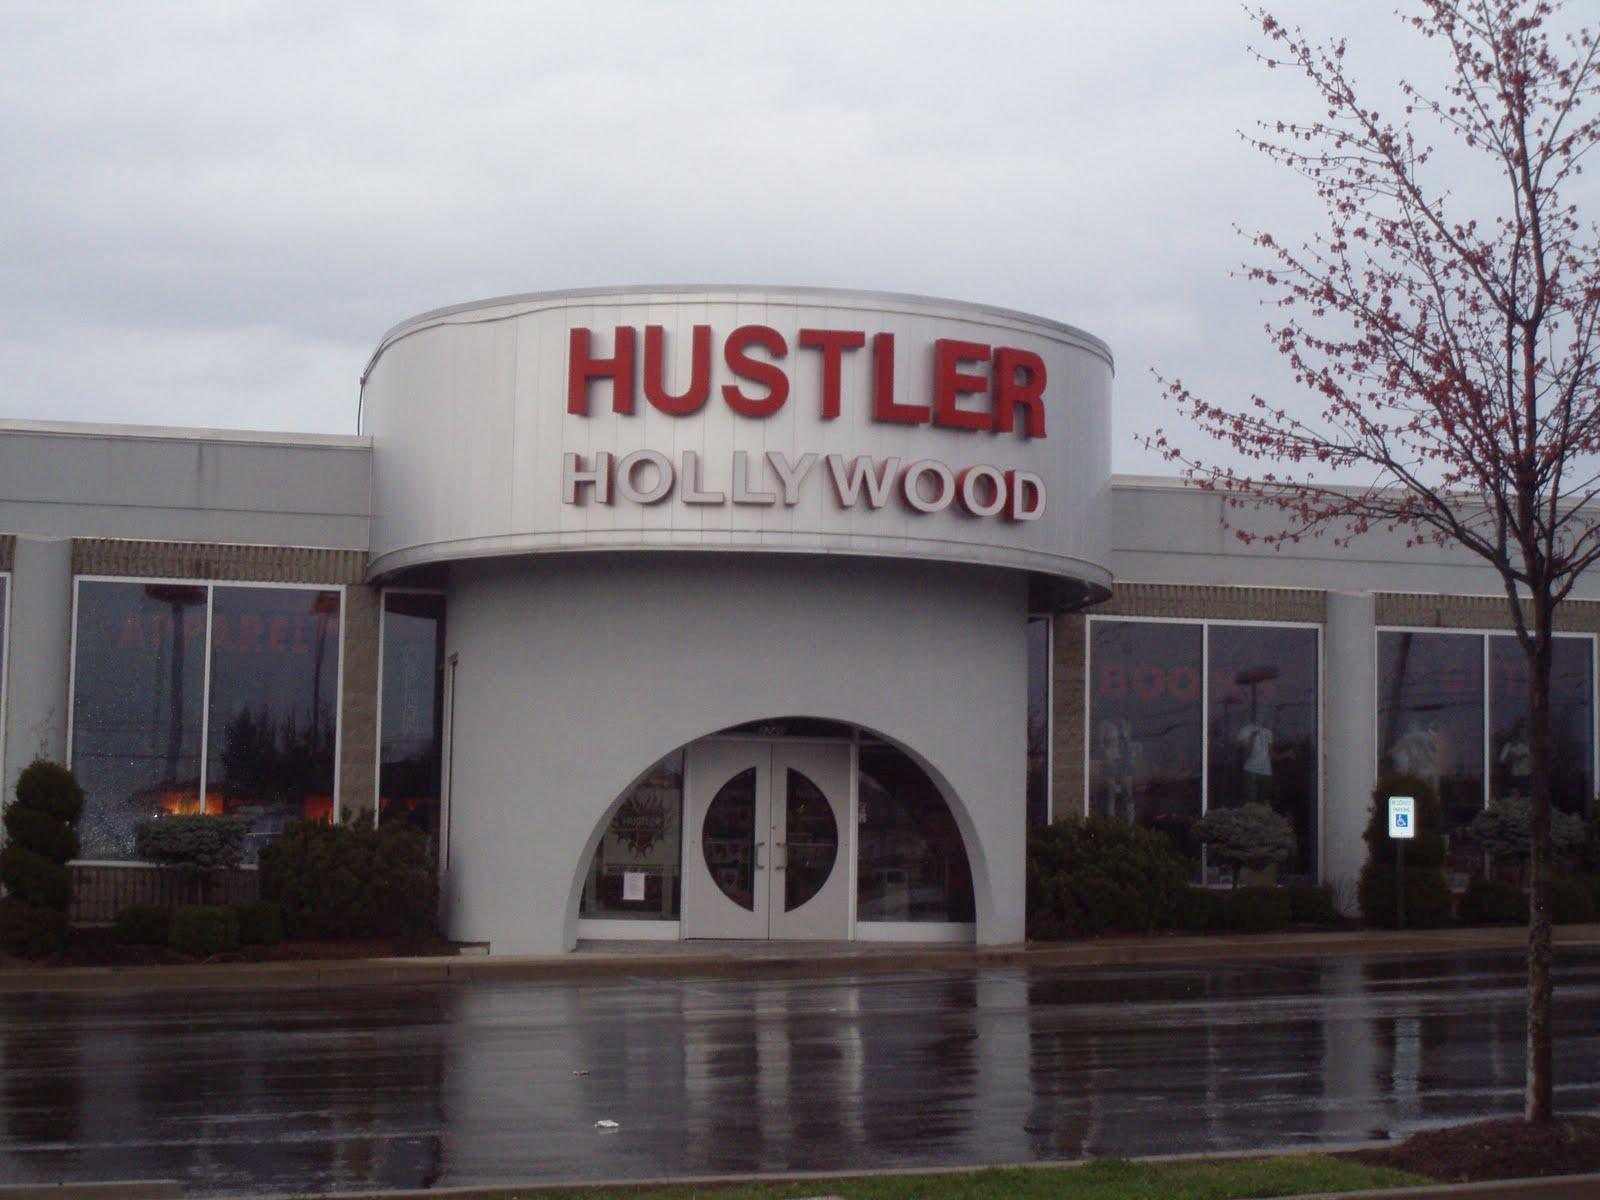 Hustler website